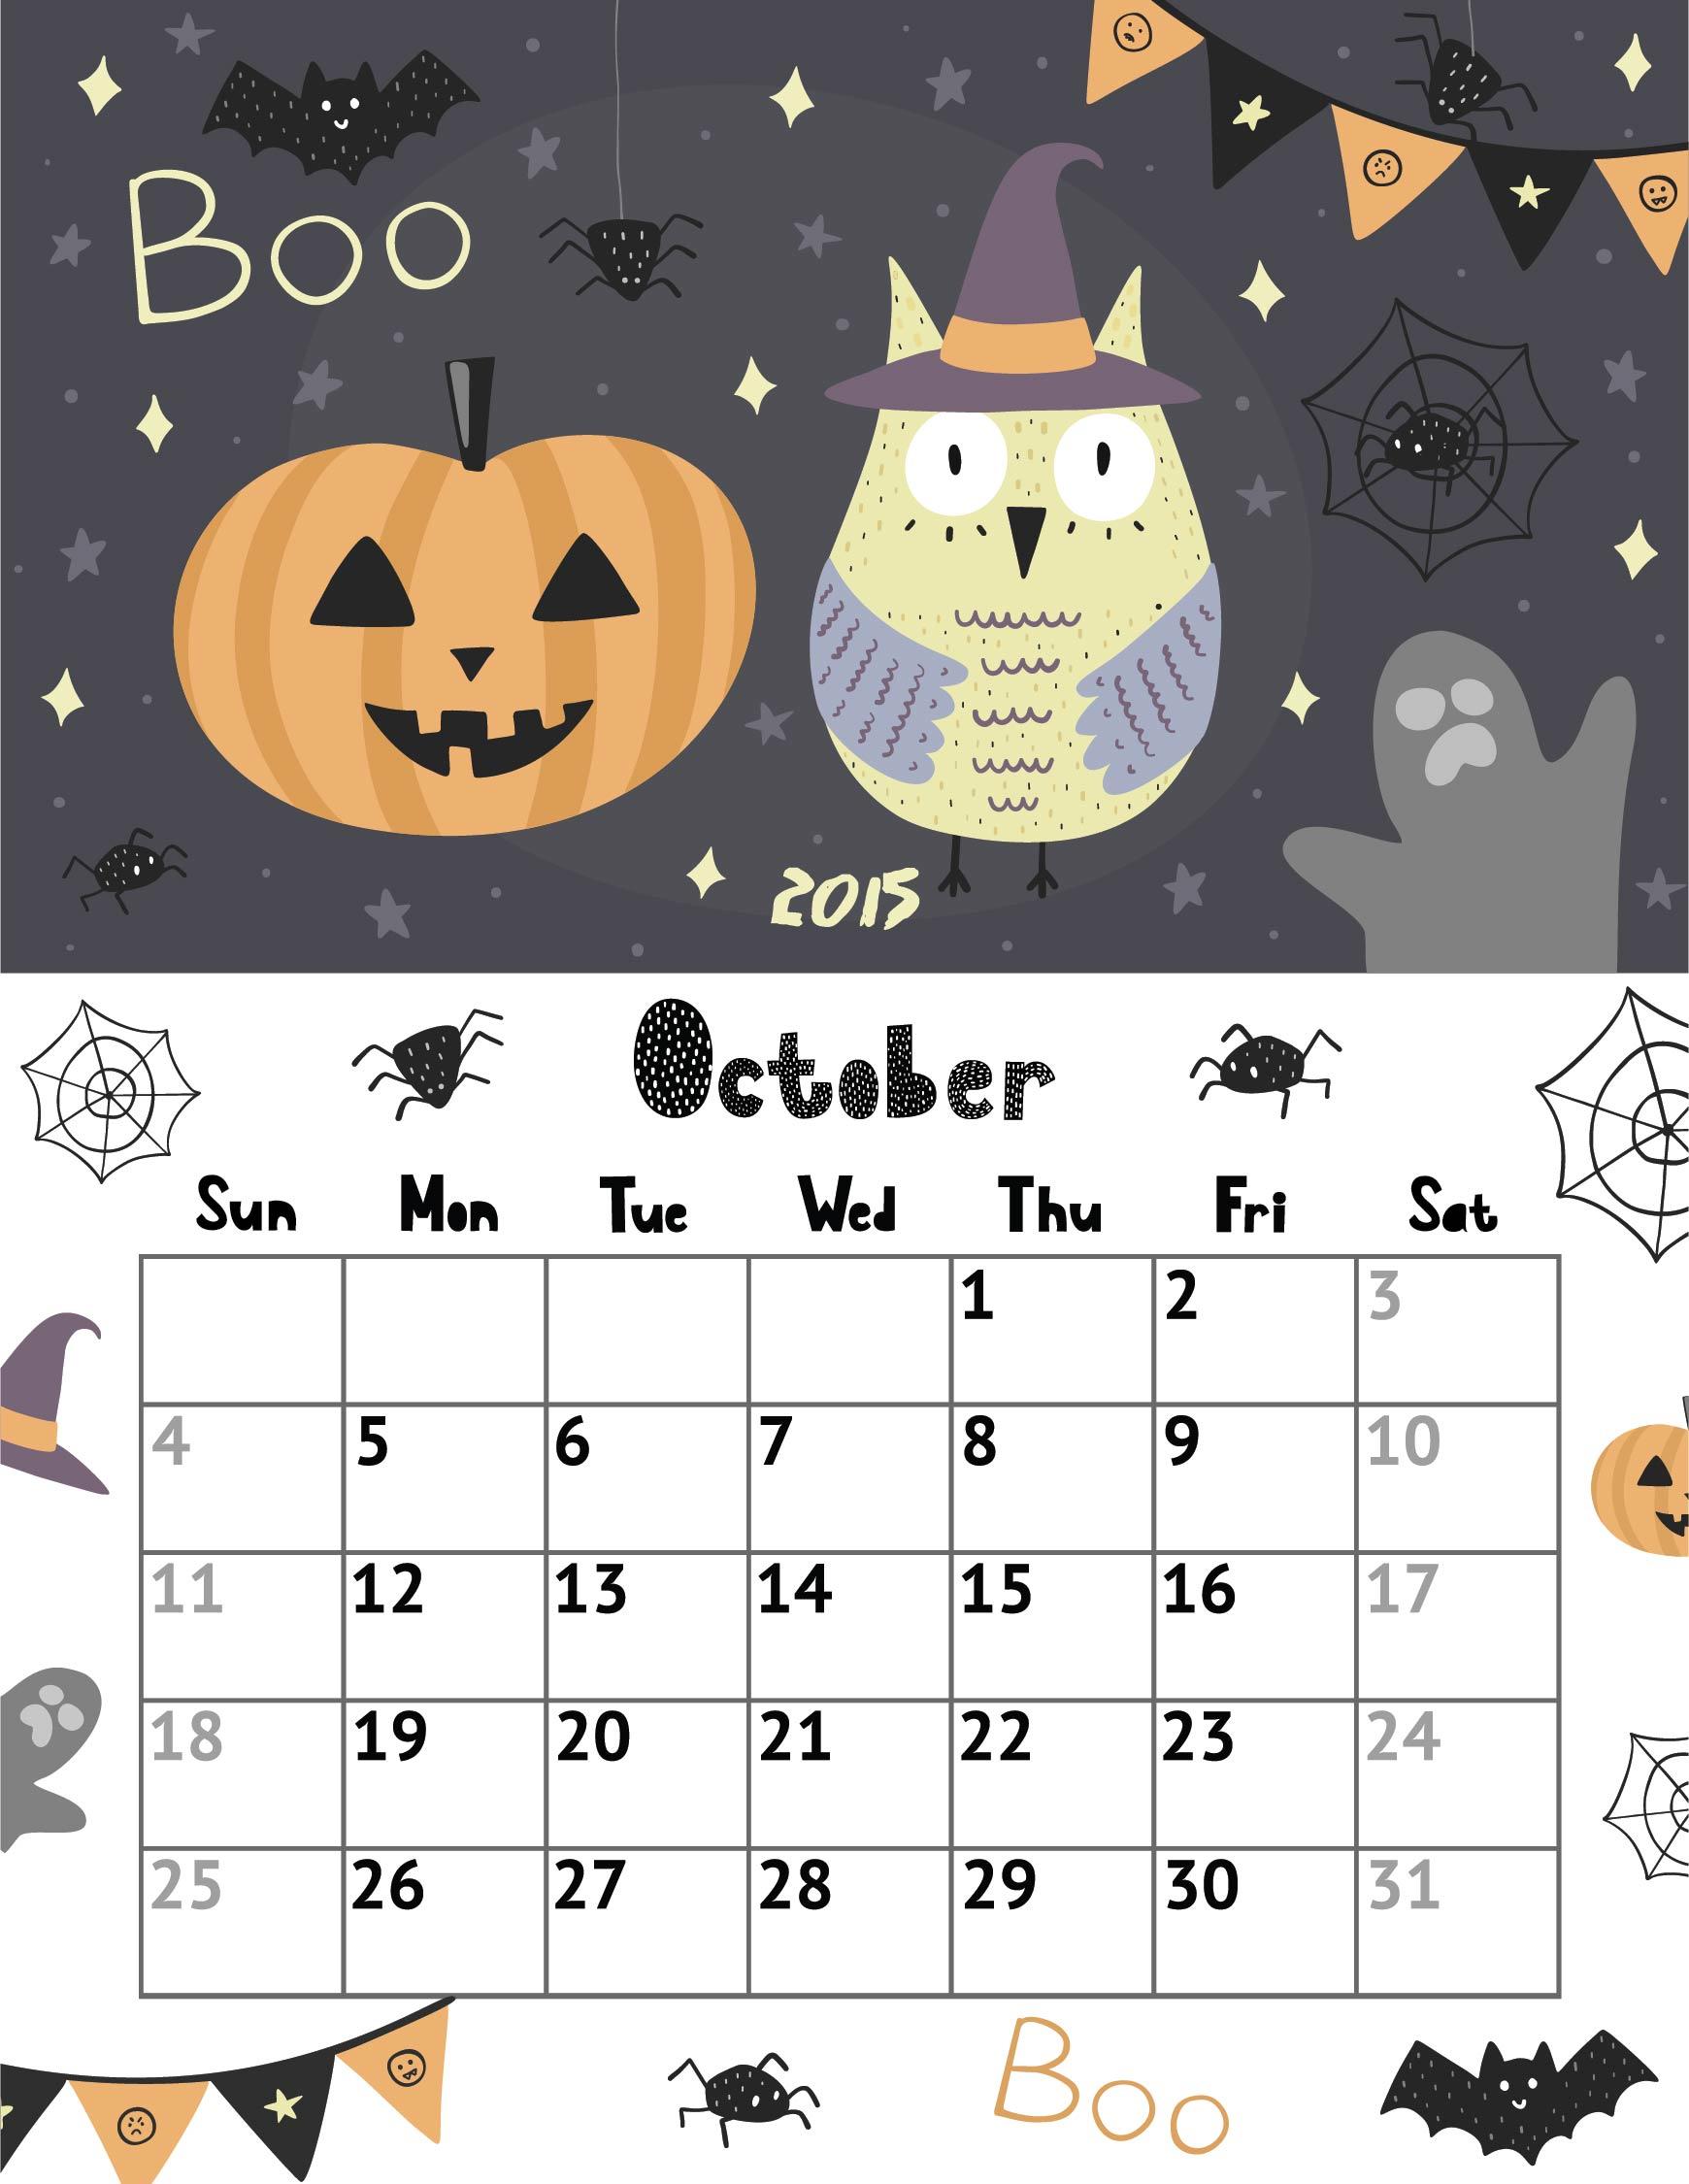 2015 Calendar Printable October Halloween